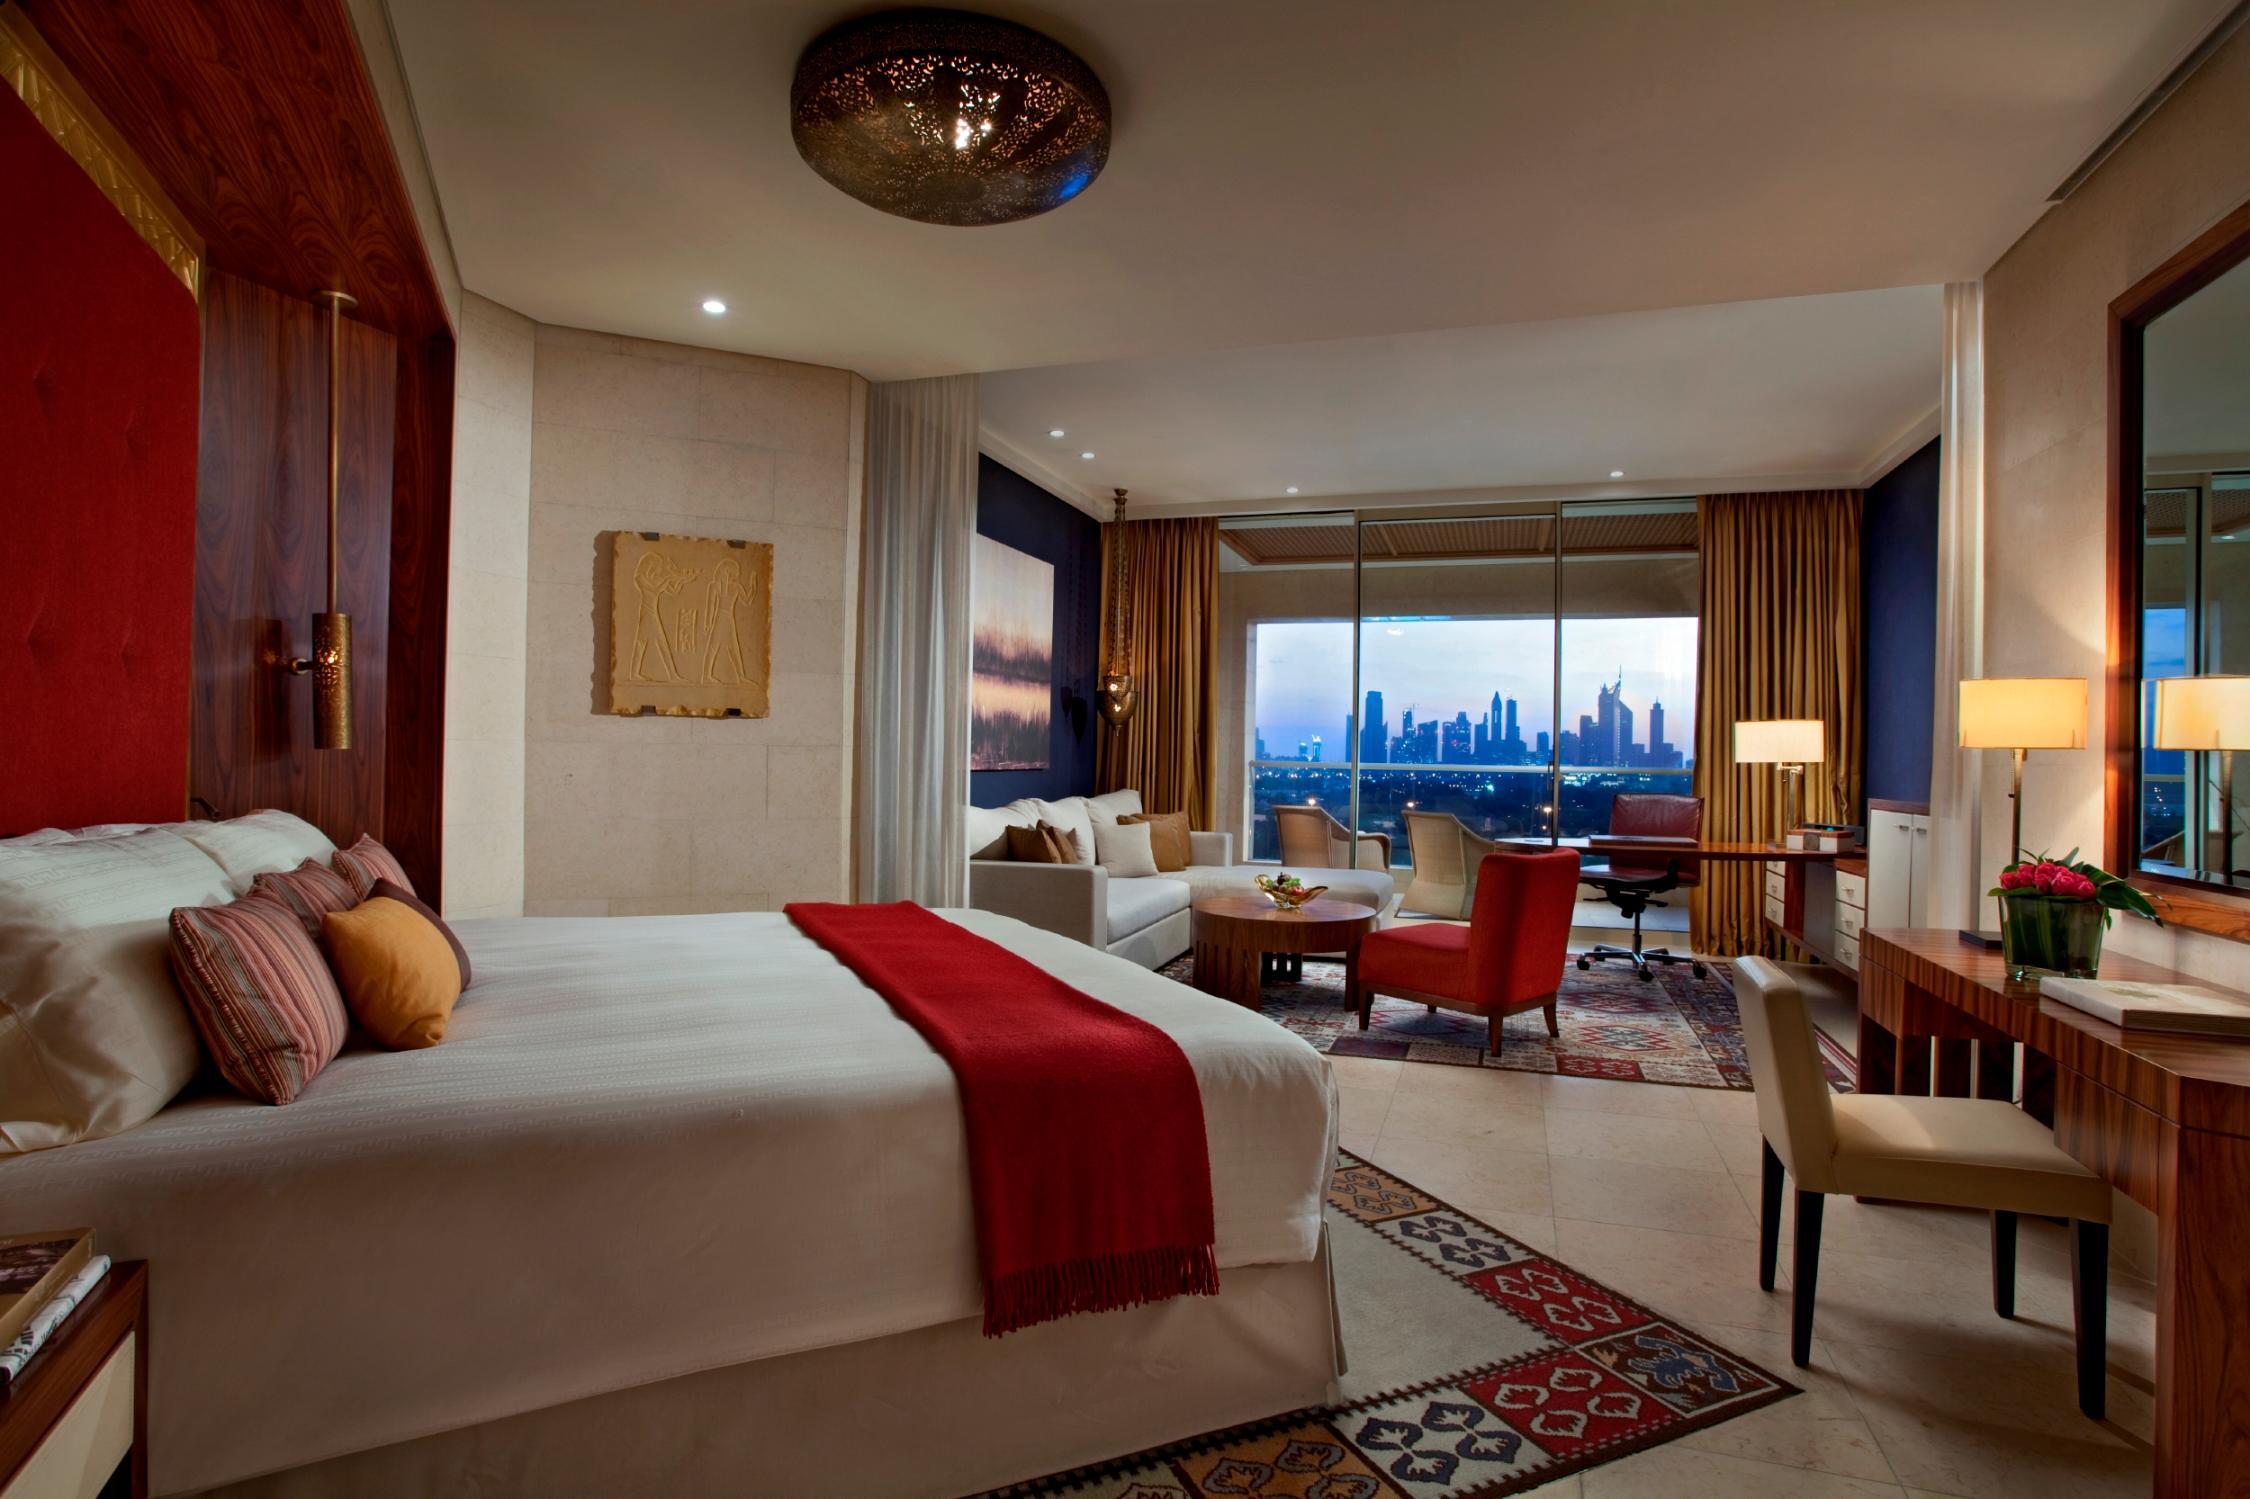 Raffles Club Skyline Room image 1 at Raffles Dubai by null, Dubai, United Arab Emirates